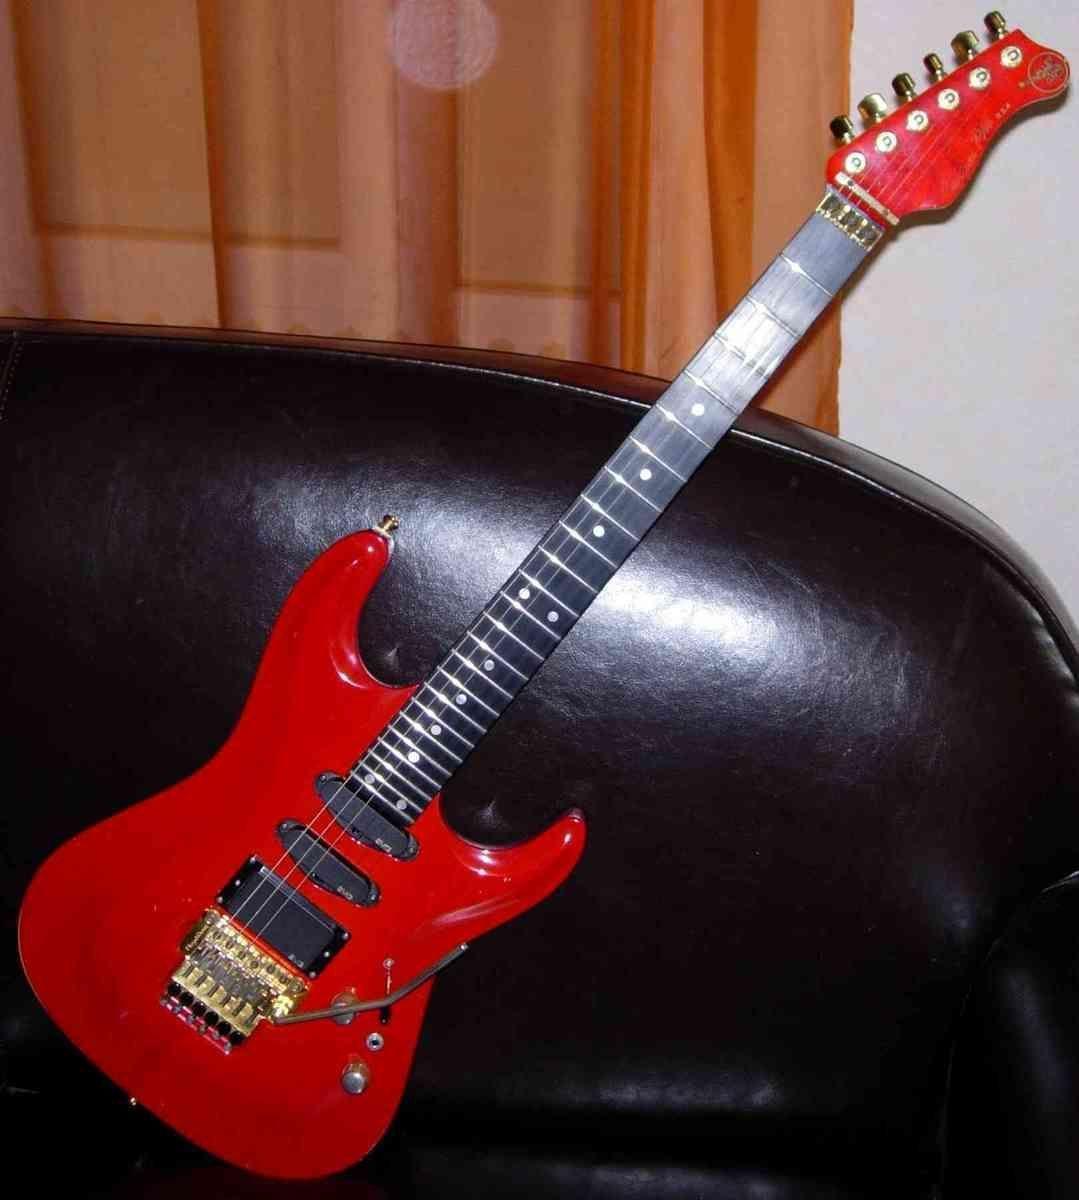 valley arts guitars custom pro usa archtop image 204687 audiofanzine. Black Bedroom Furniture Sets. Home Design Ideas